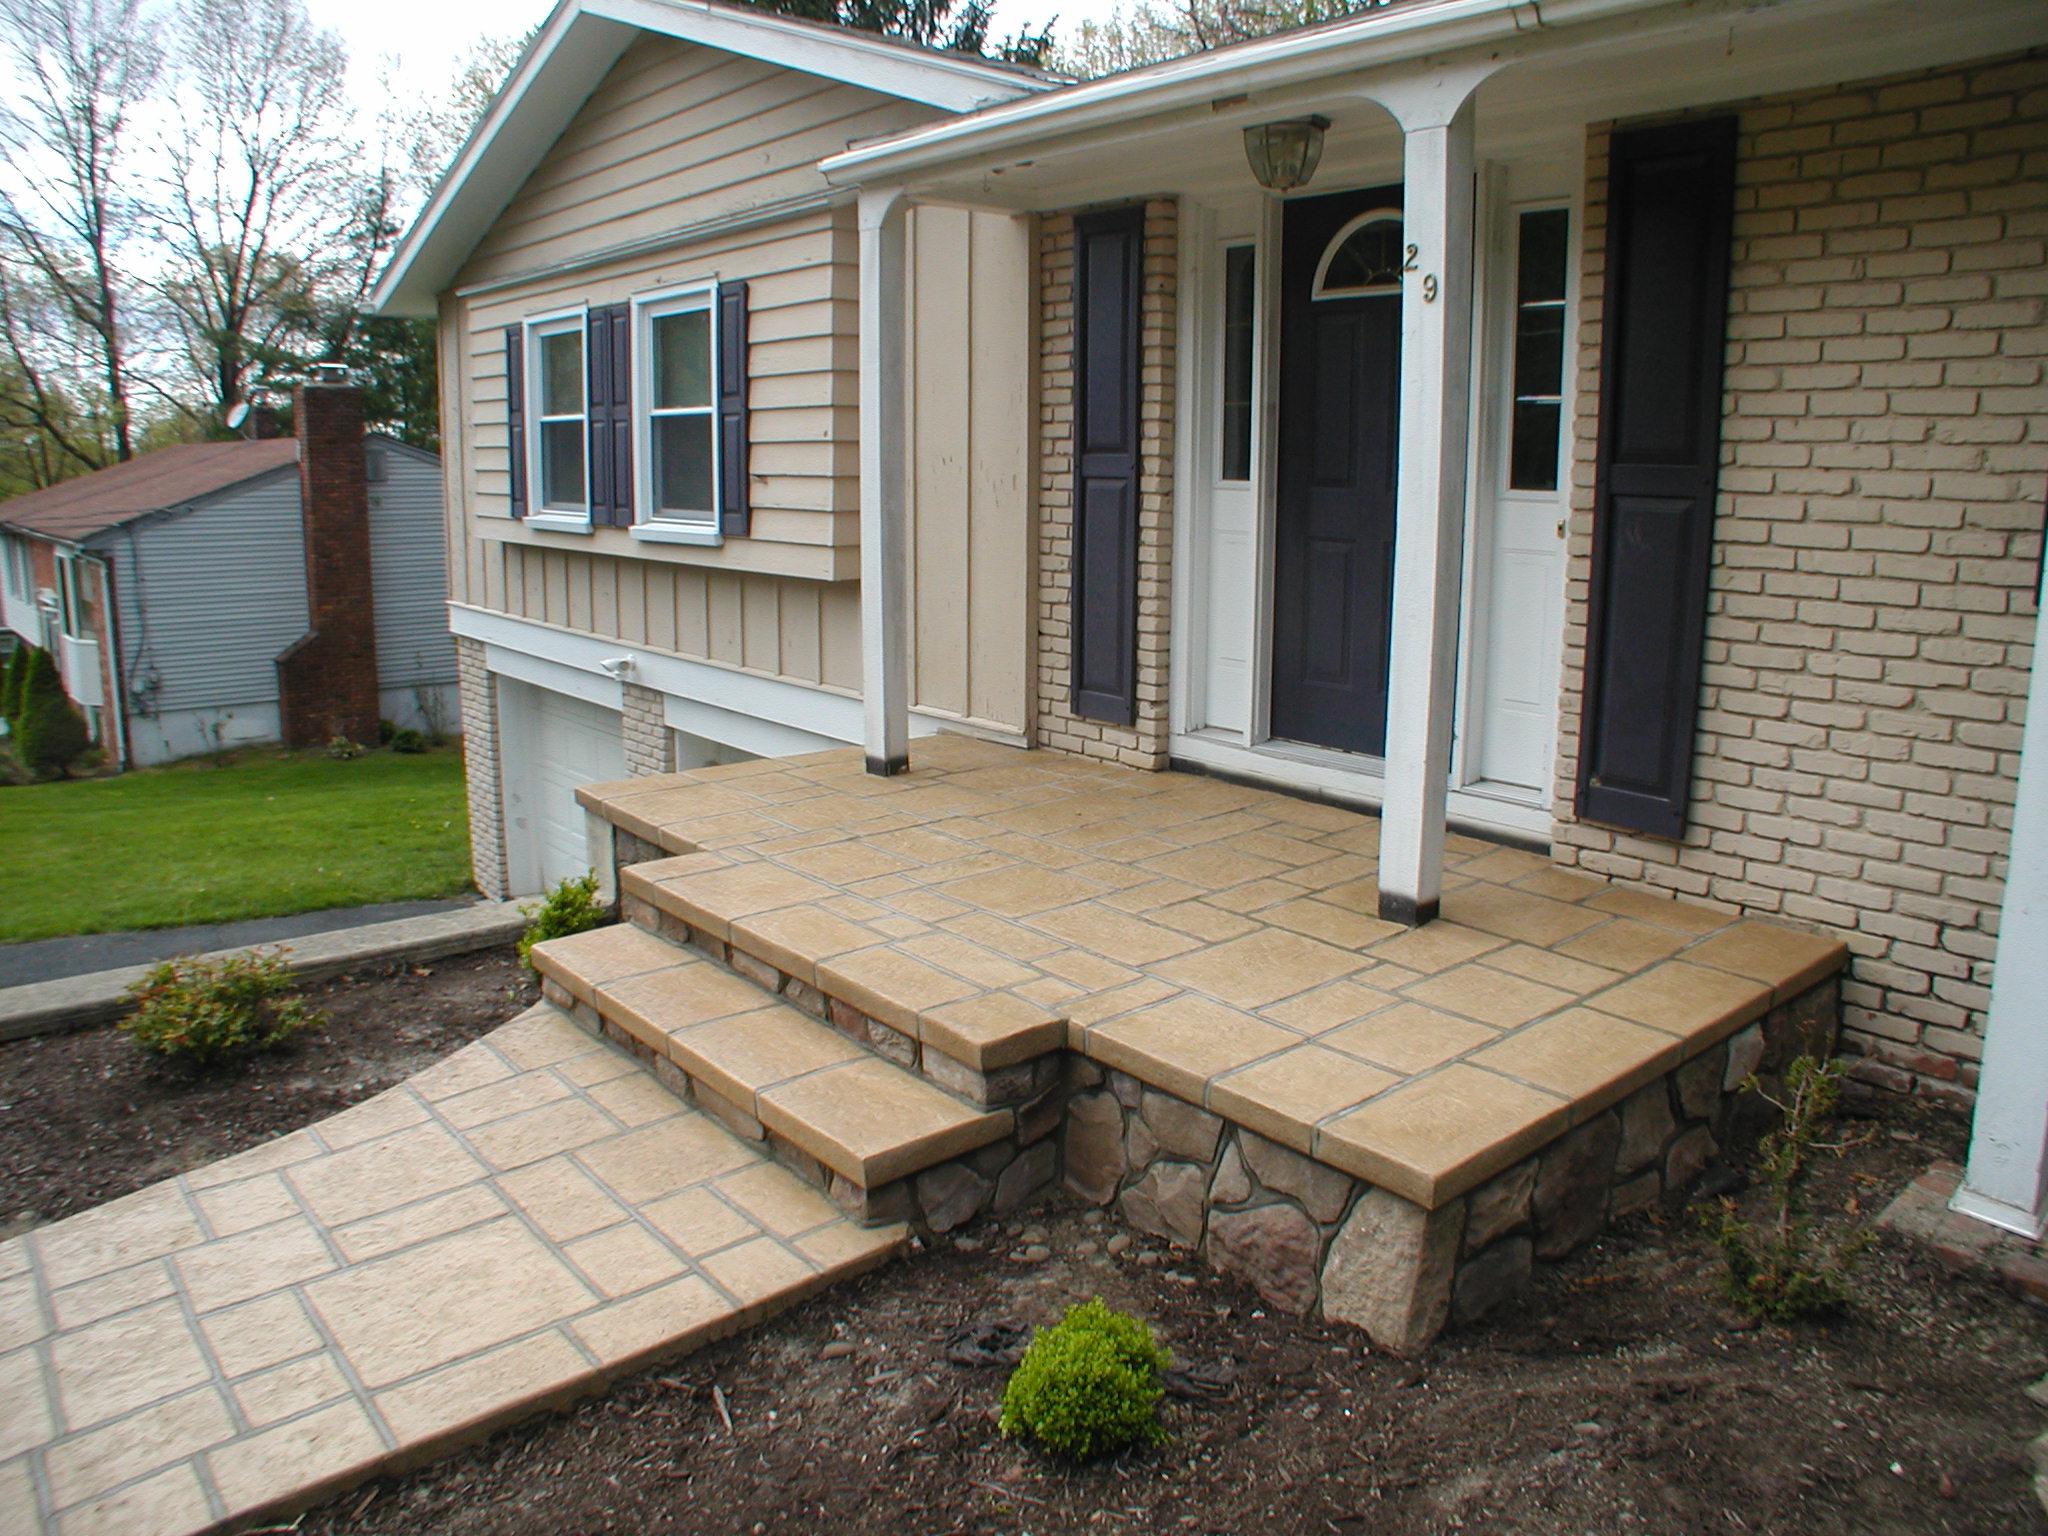 Resurfacing Concrete Steps With Tile | Zef Jam